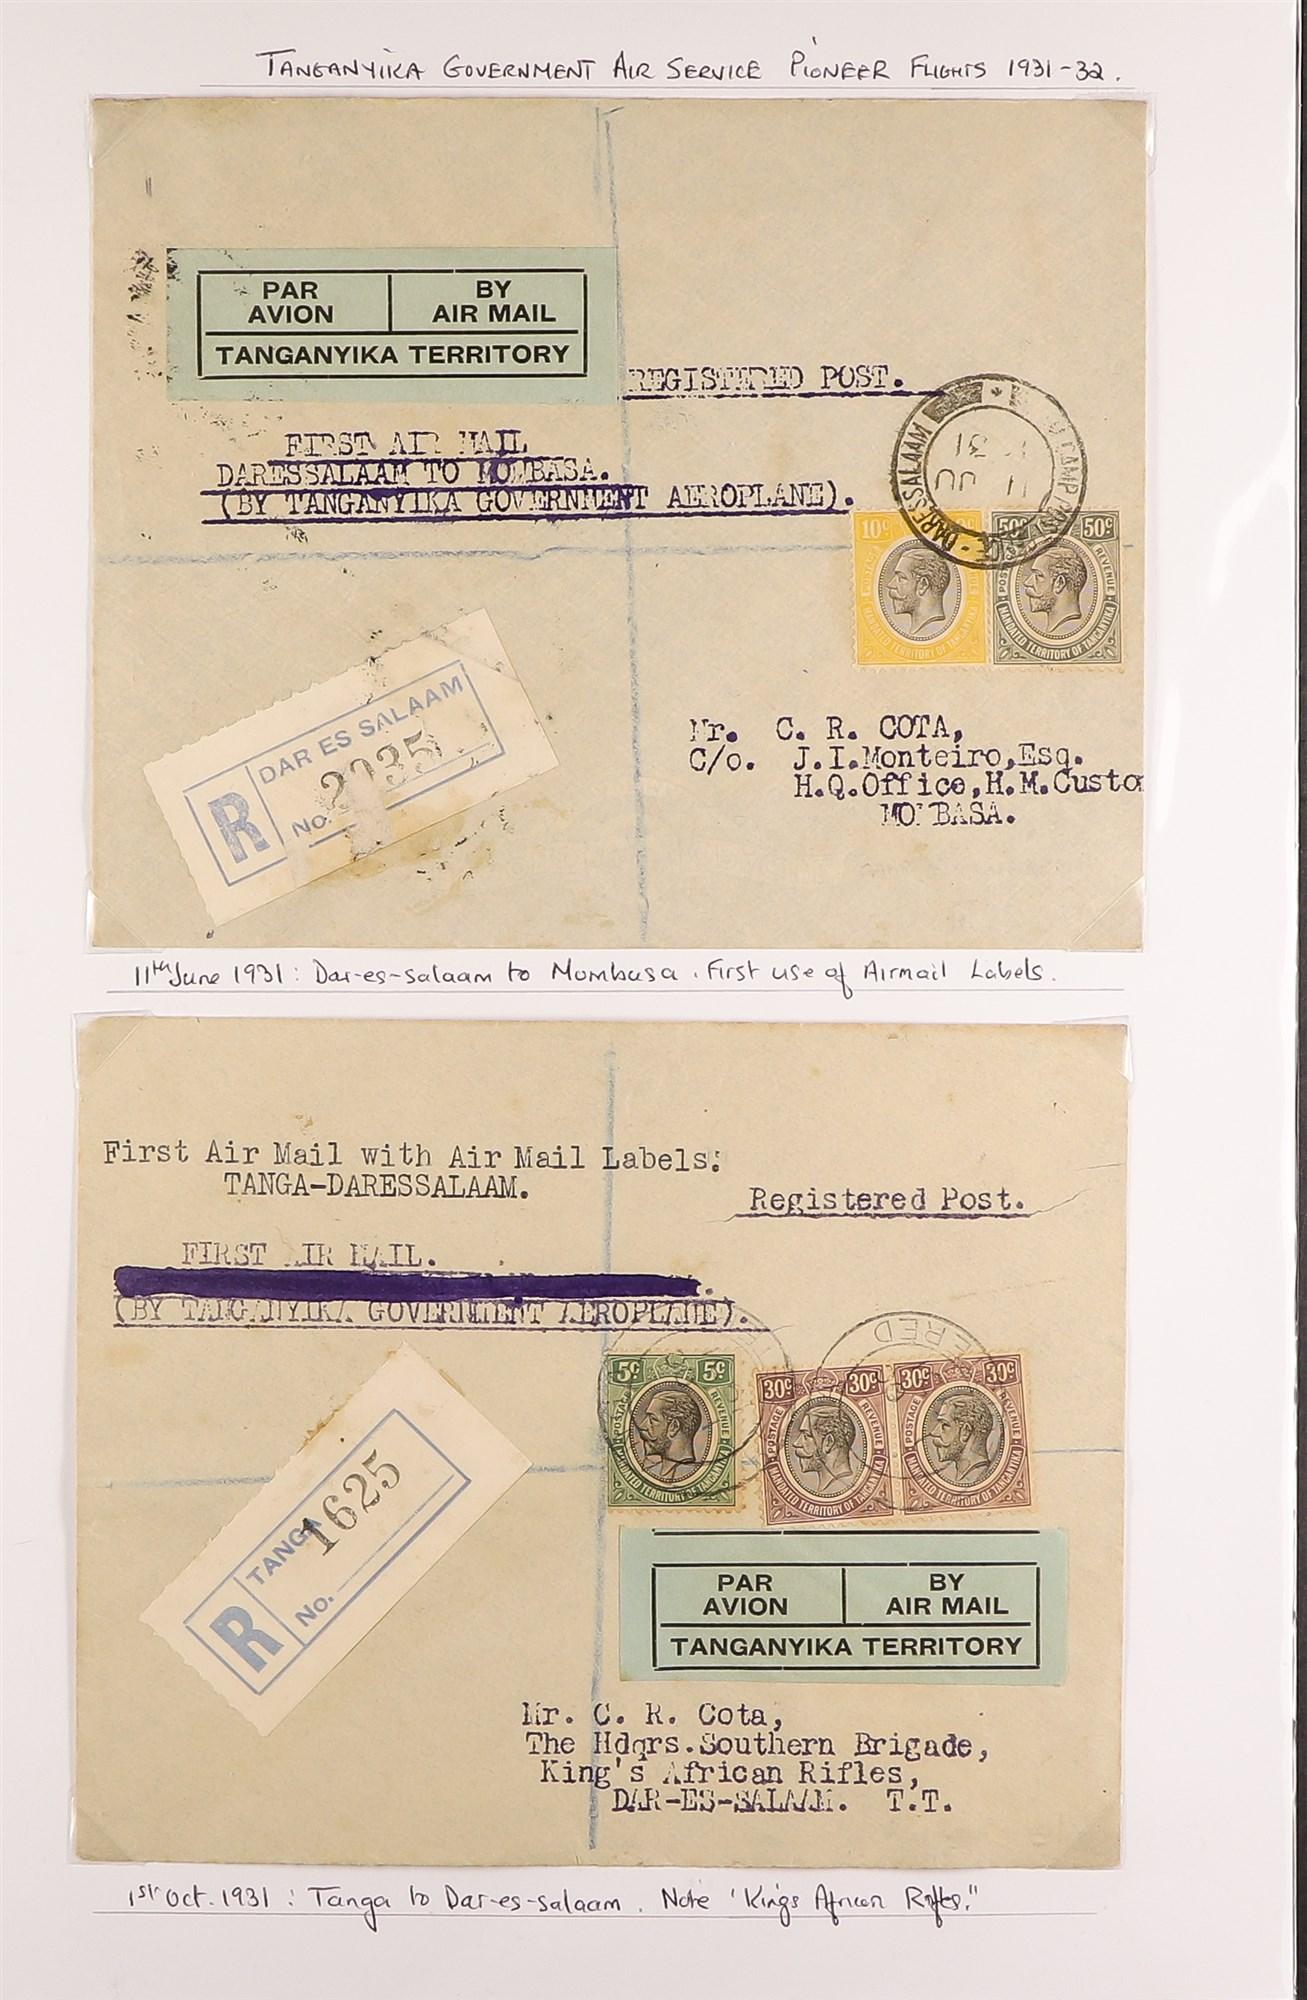 K.U.T. 1927-36 AIRMAIL COVERS COLLECTION incl. 1927 Kenya-Sudan, 1931 Christmas Flight, 1931 - Image 4 of 4